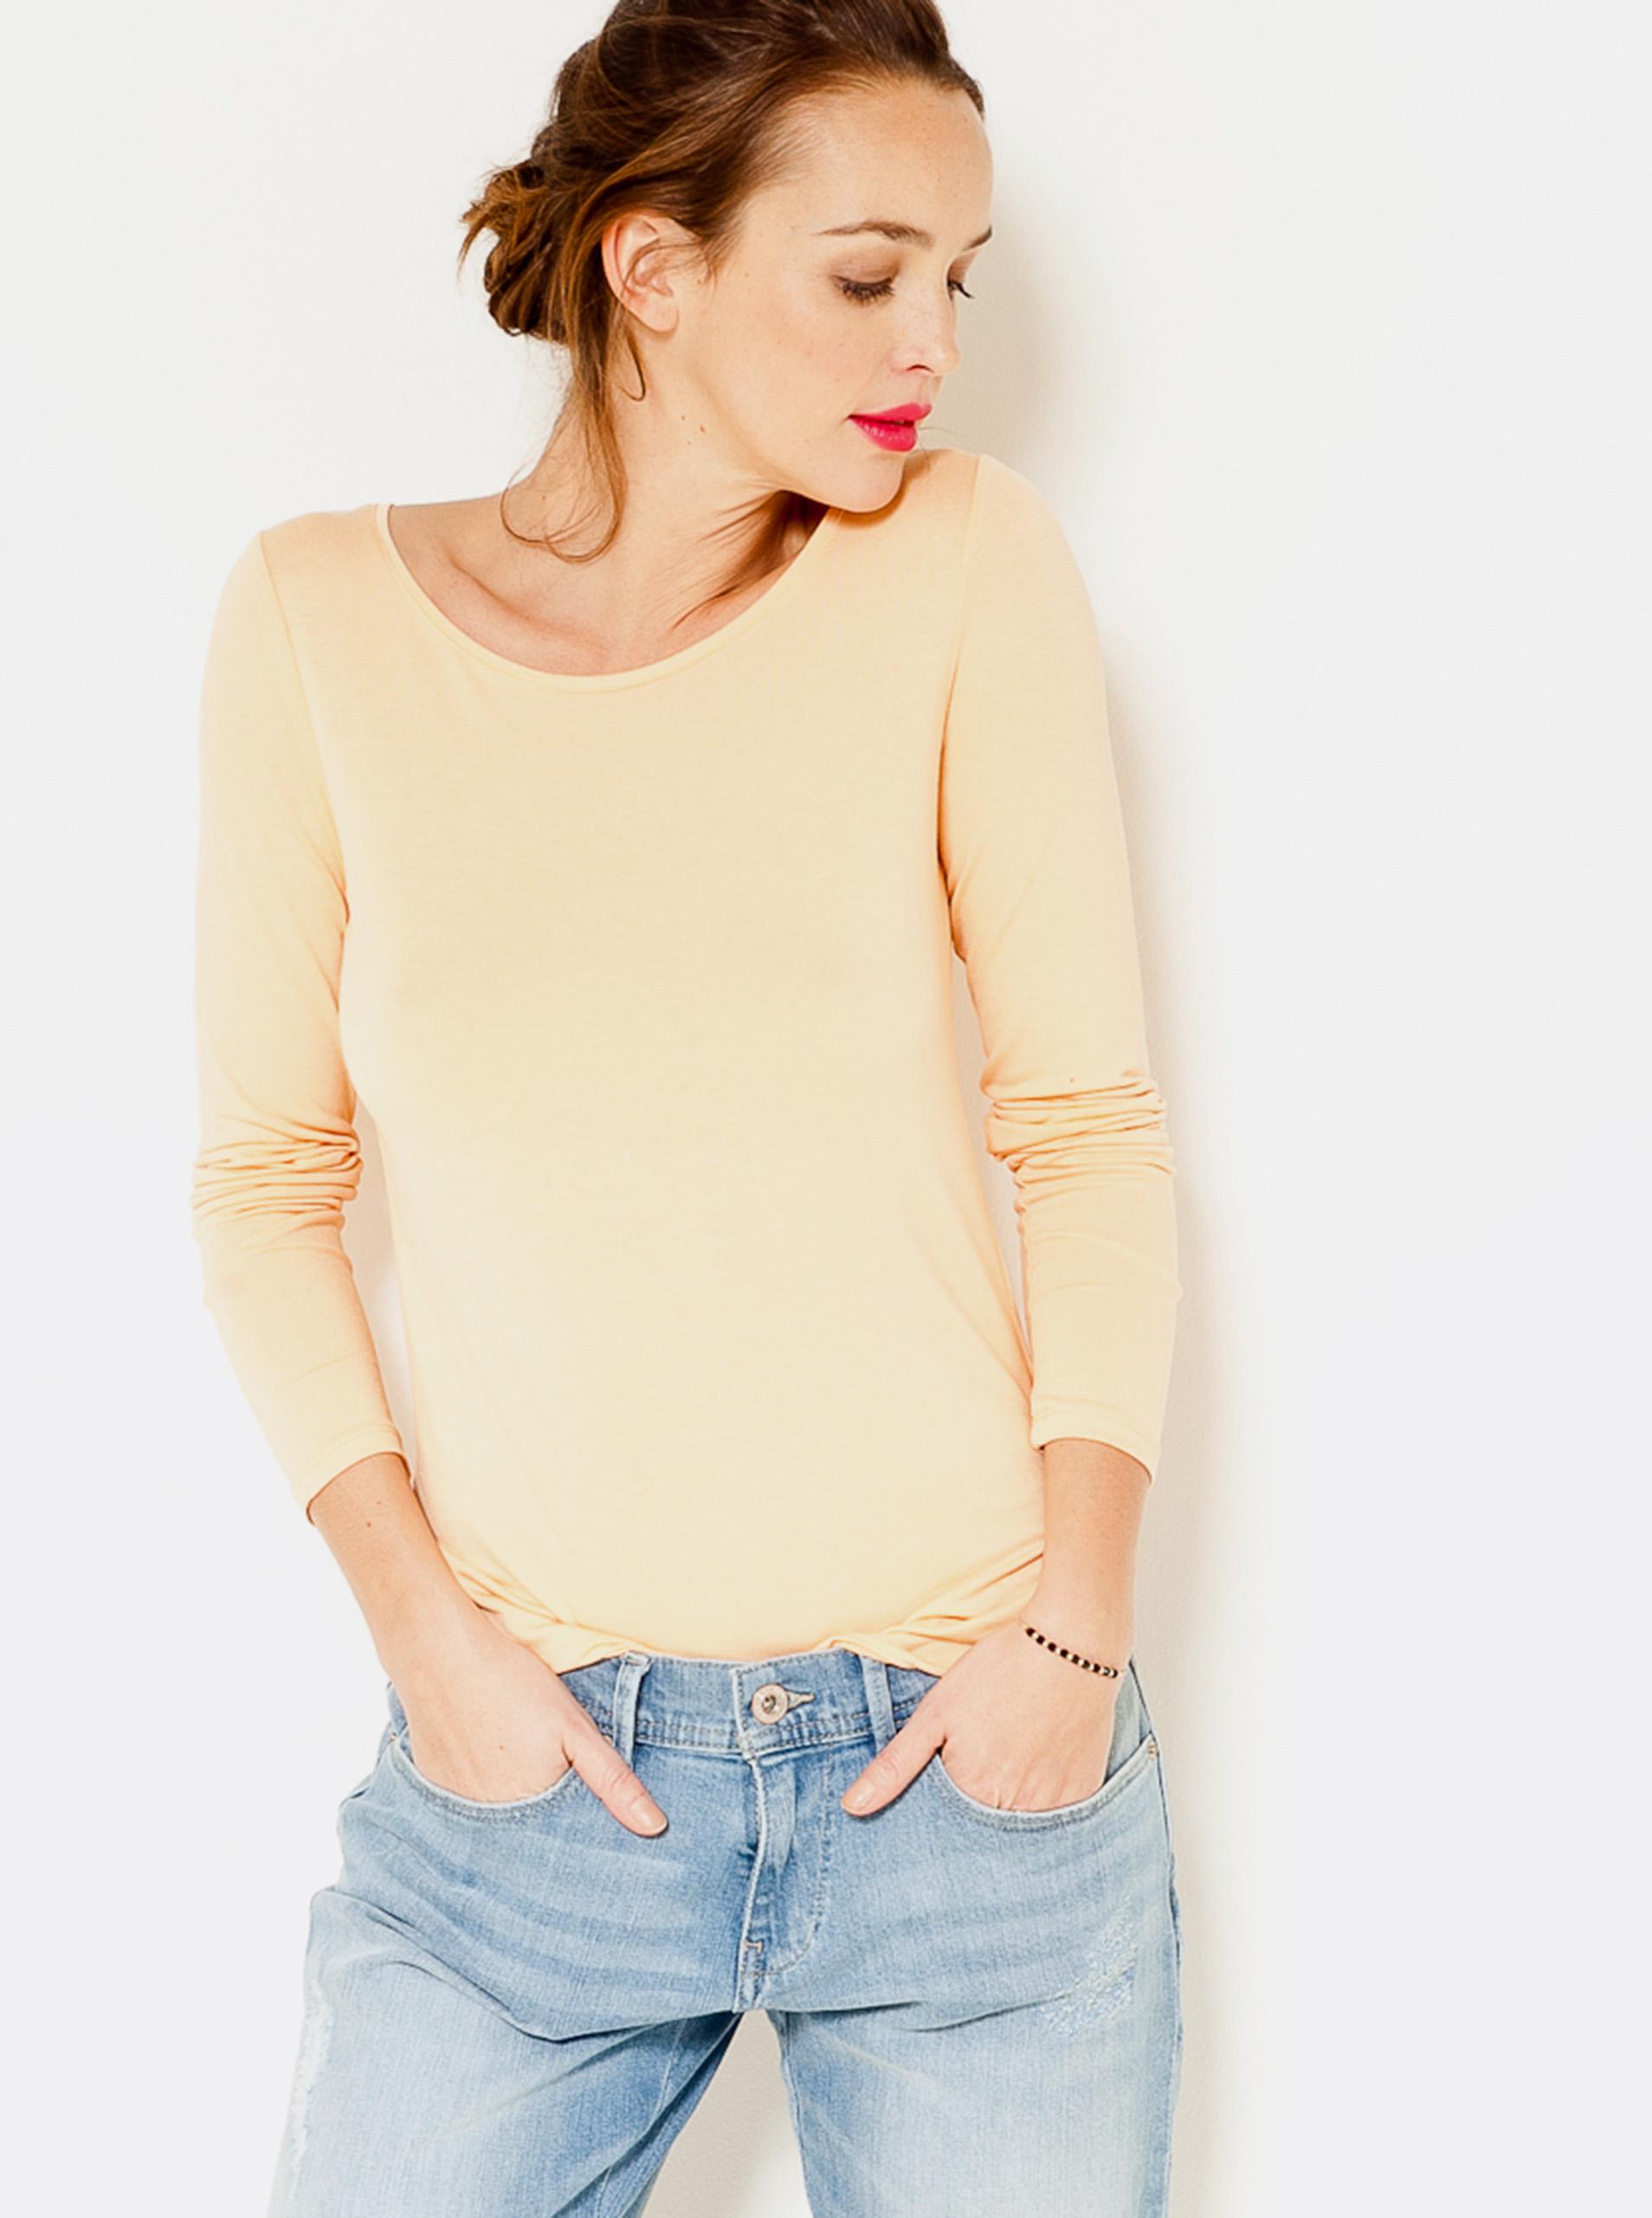 Bluze pentru femei CAMAIEU - galben